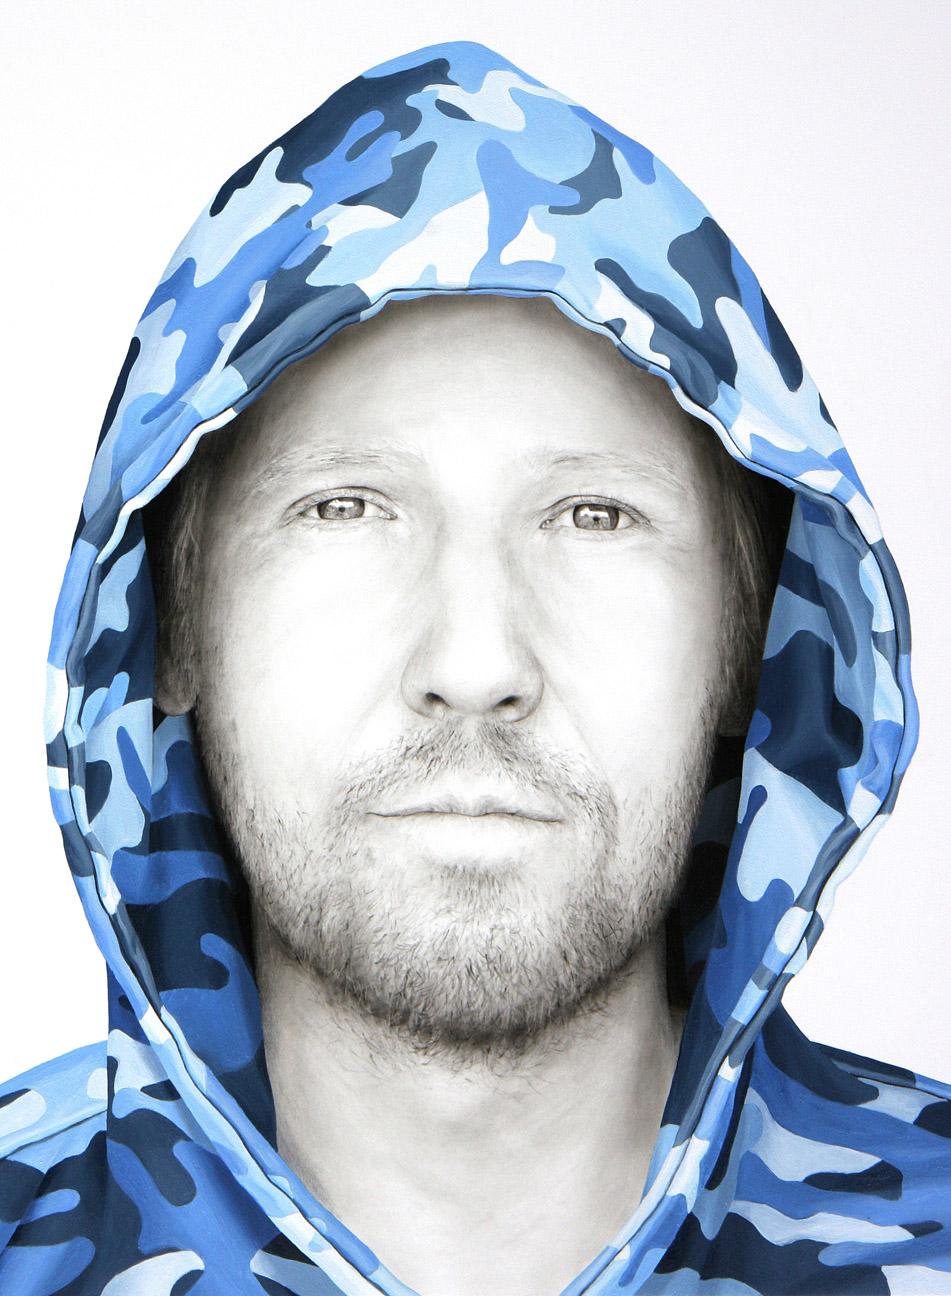 Phillip Adams Matterhorn Portrait David